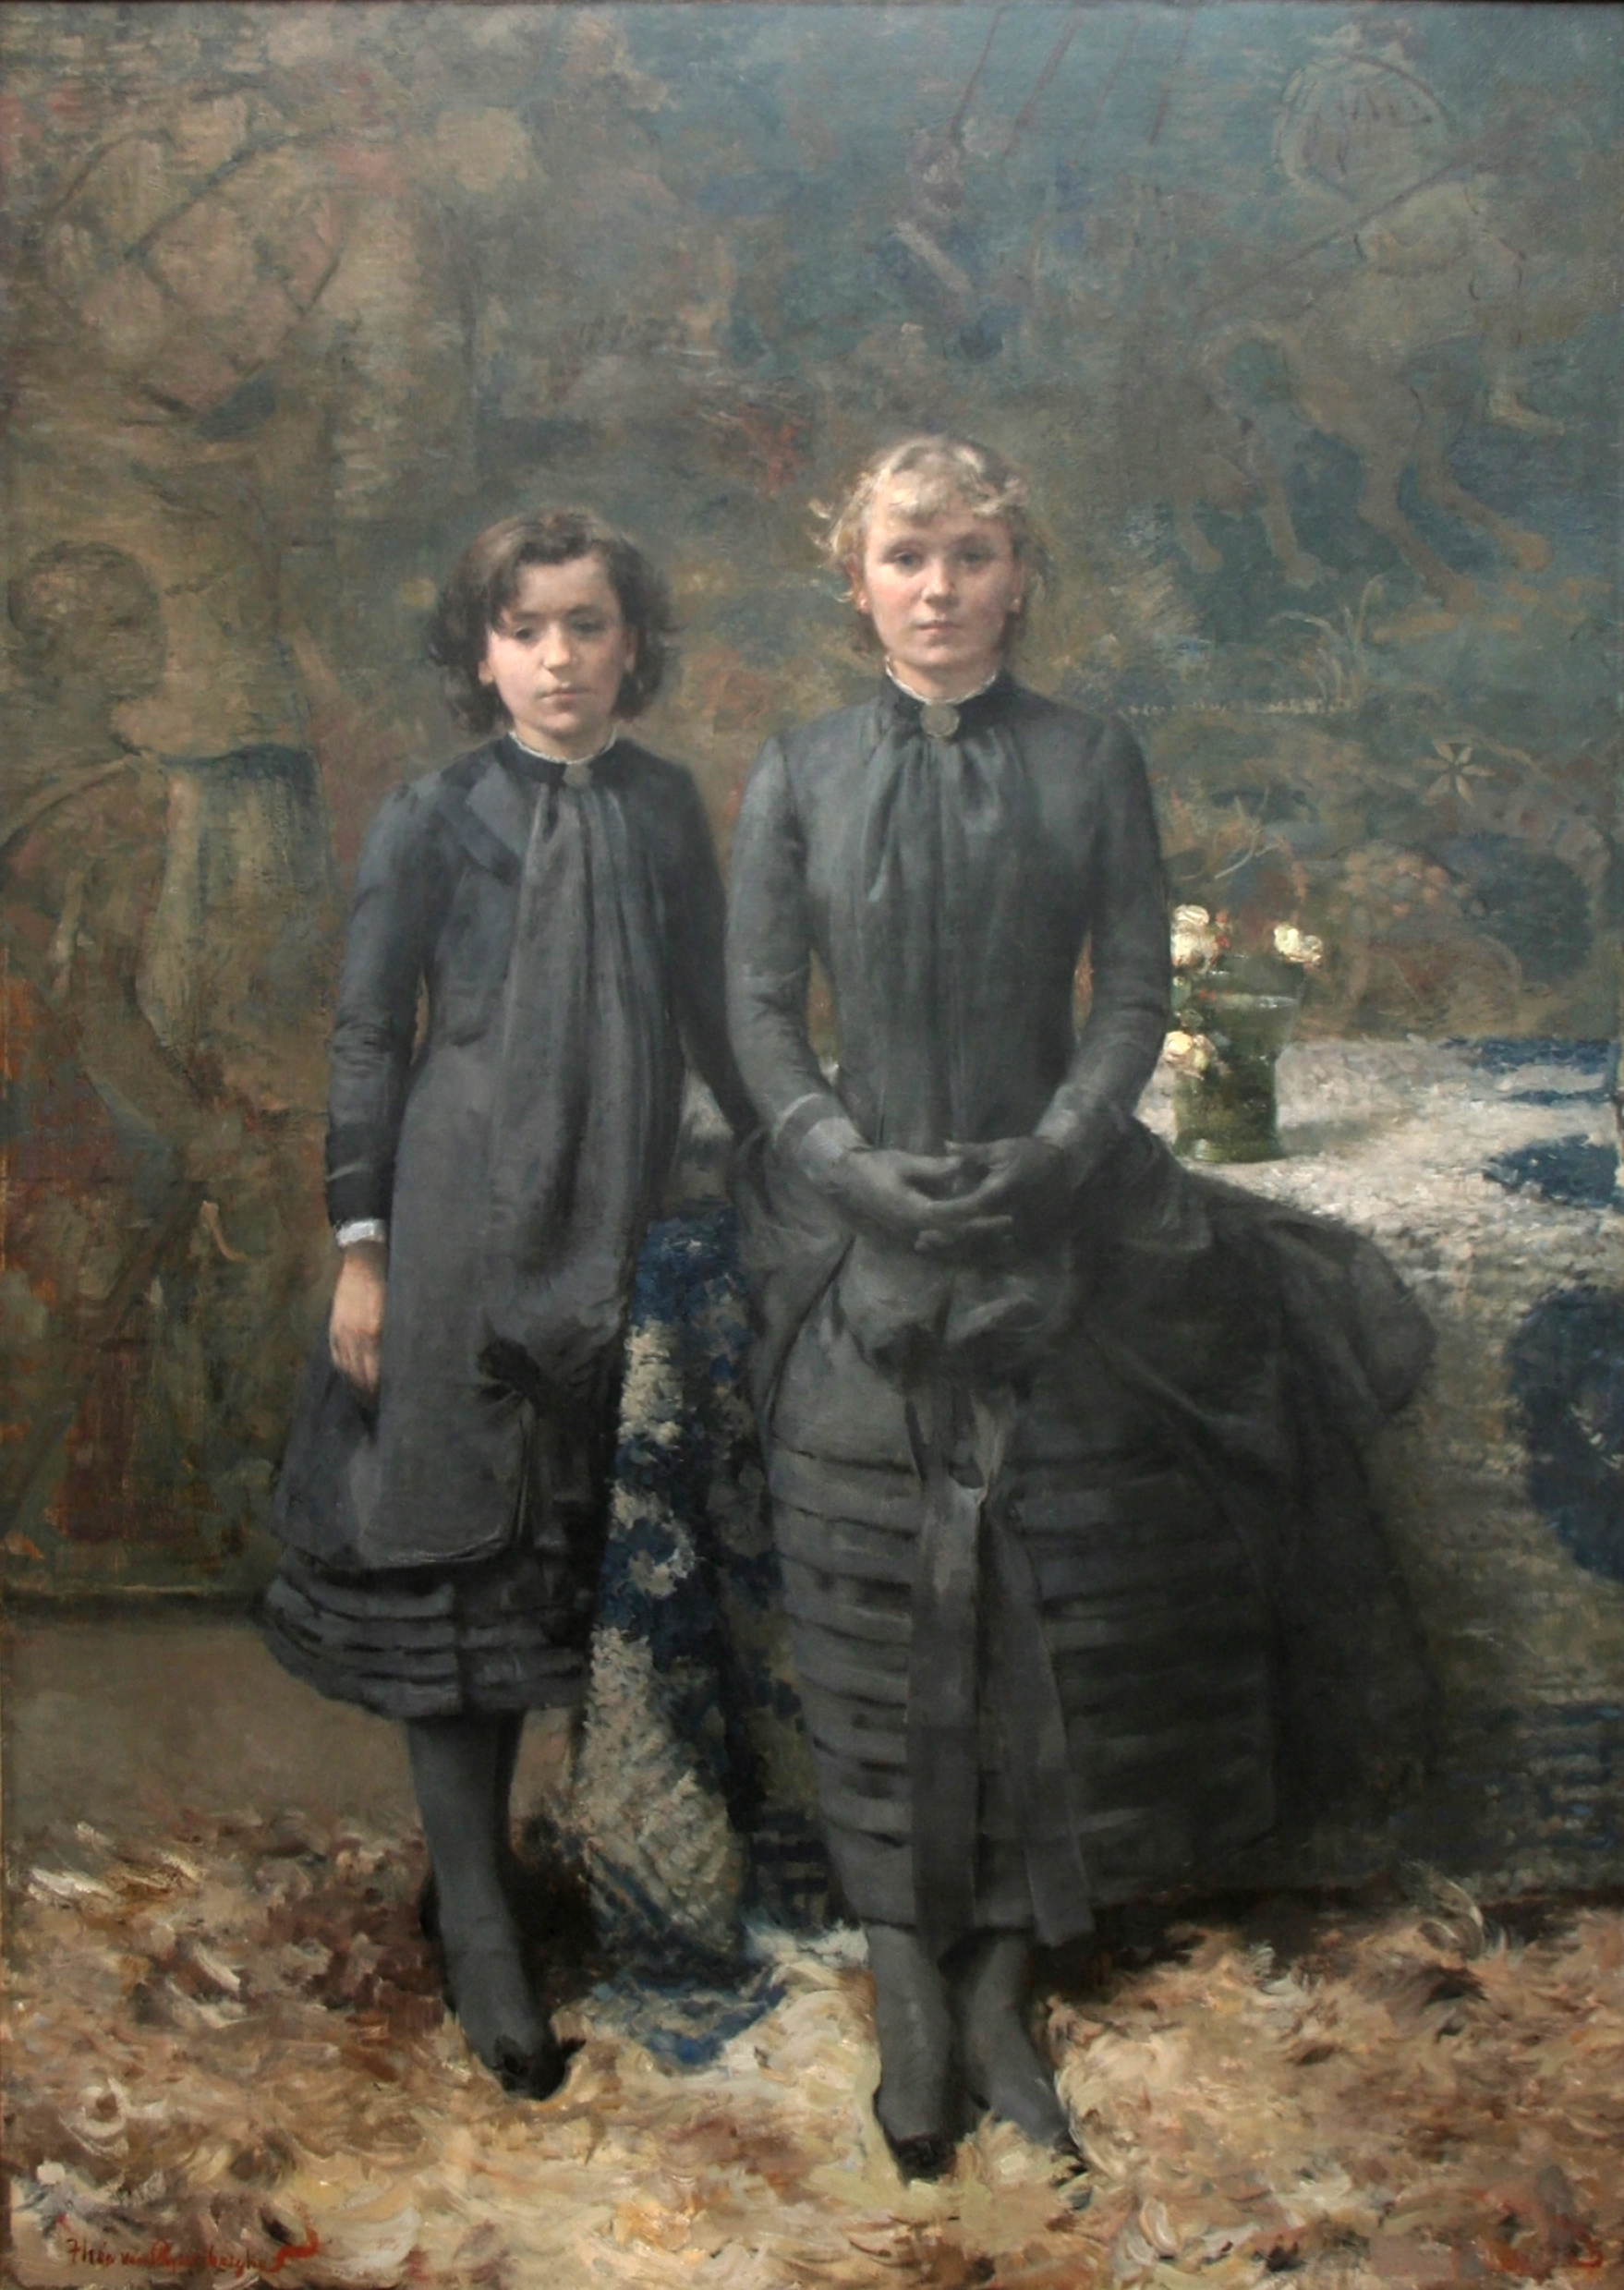 Théo_van_Rysselberghe_-_Les_Soeurs_du_peintre_Schlobach.JPG (1758×2479)